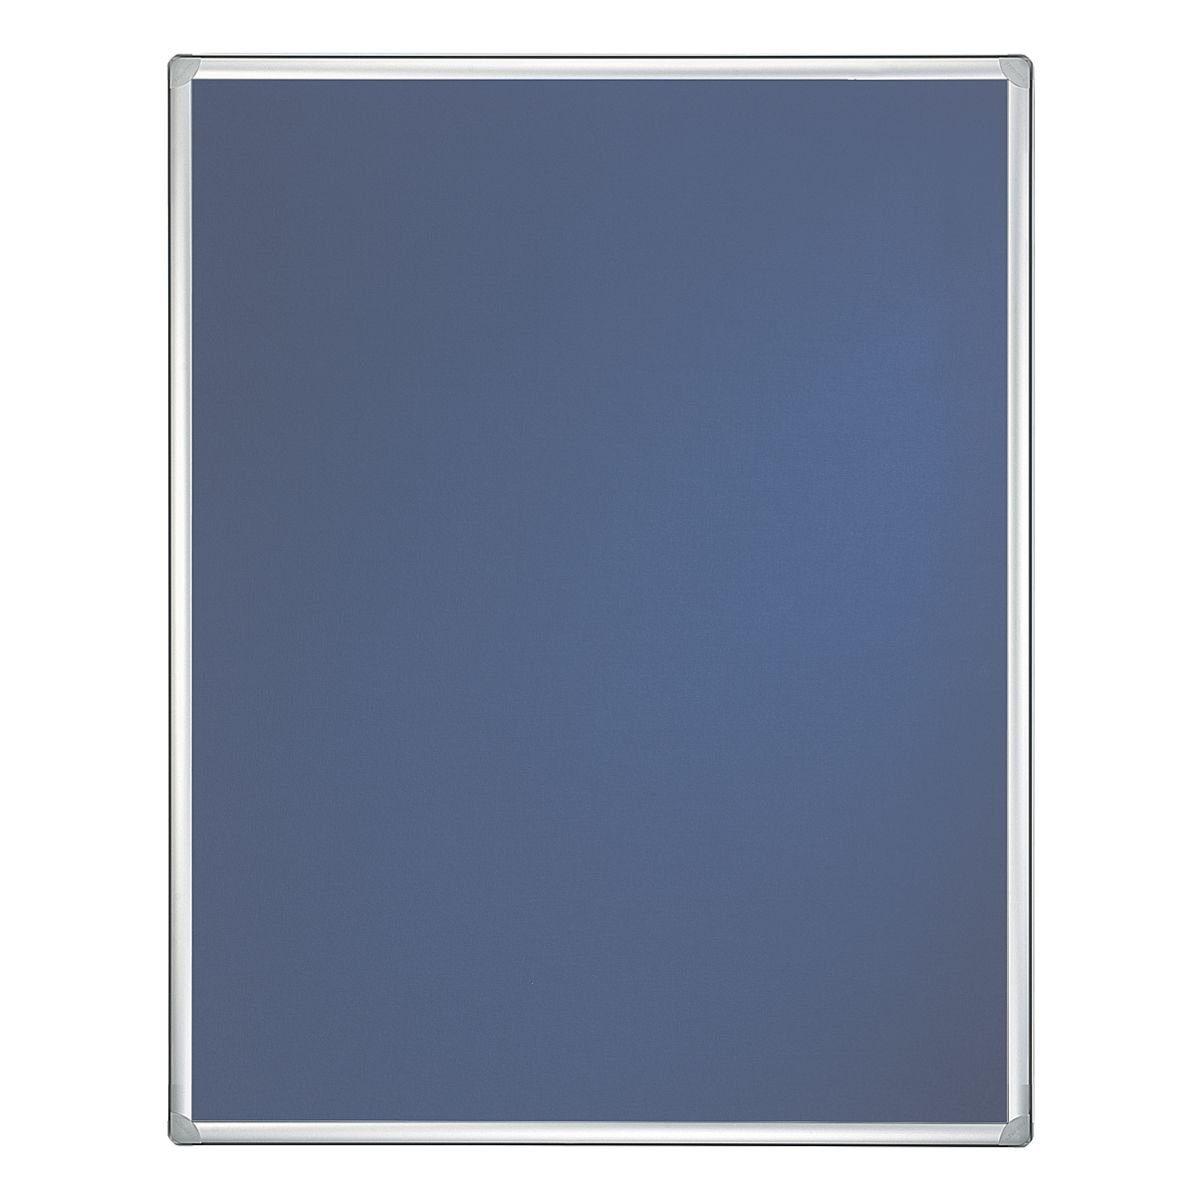 Franken Filz-Pinnwand 150 x 100 cm »Pro«